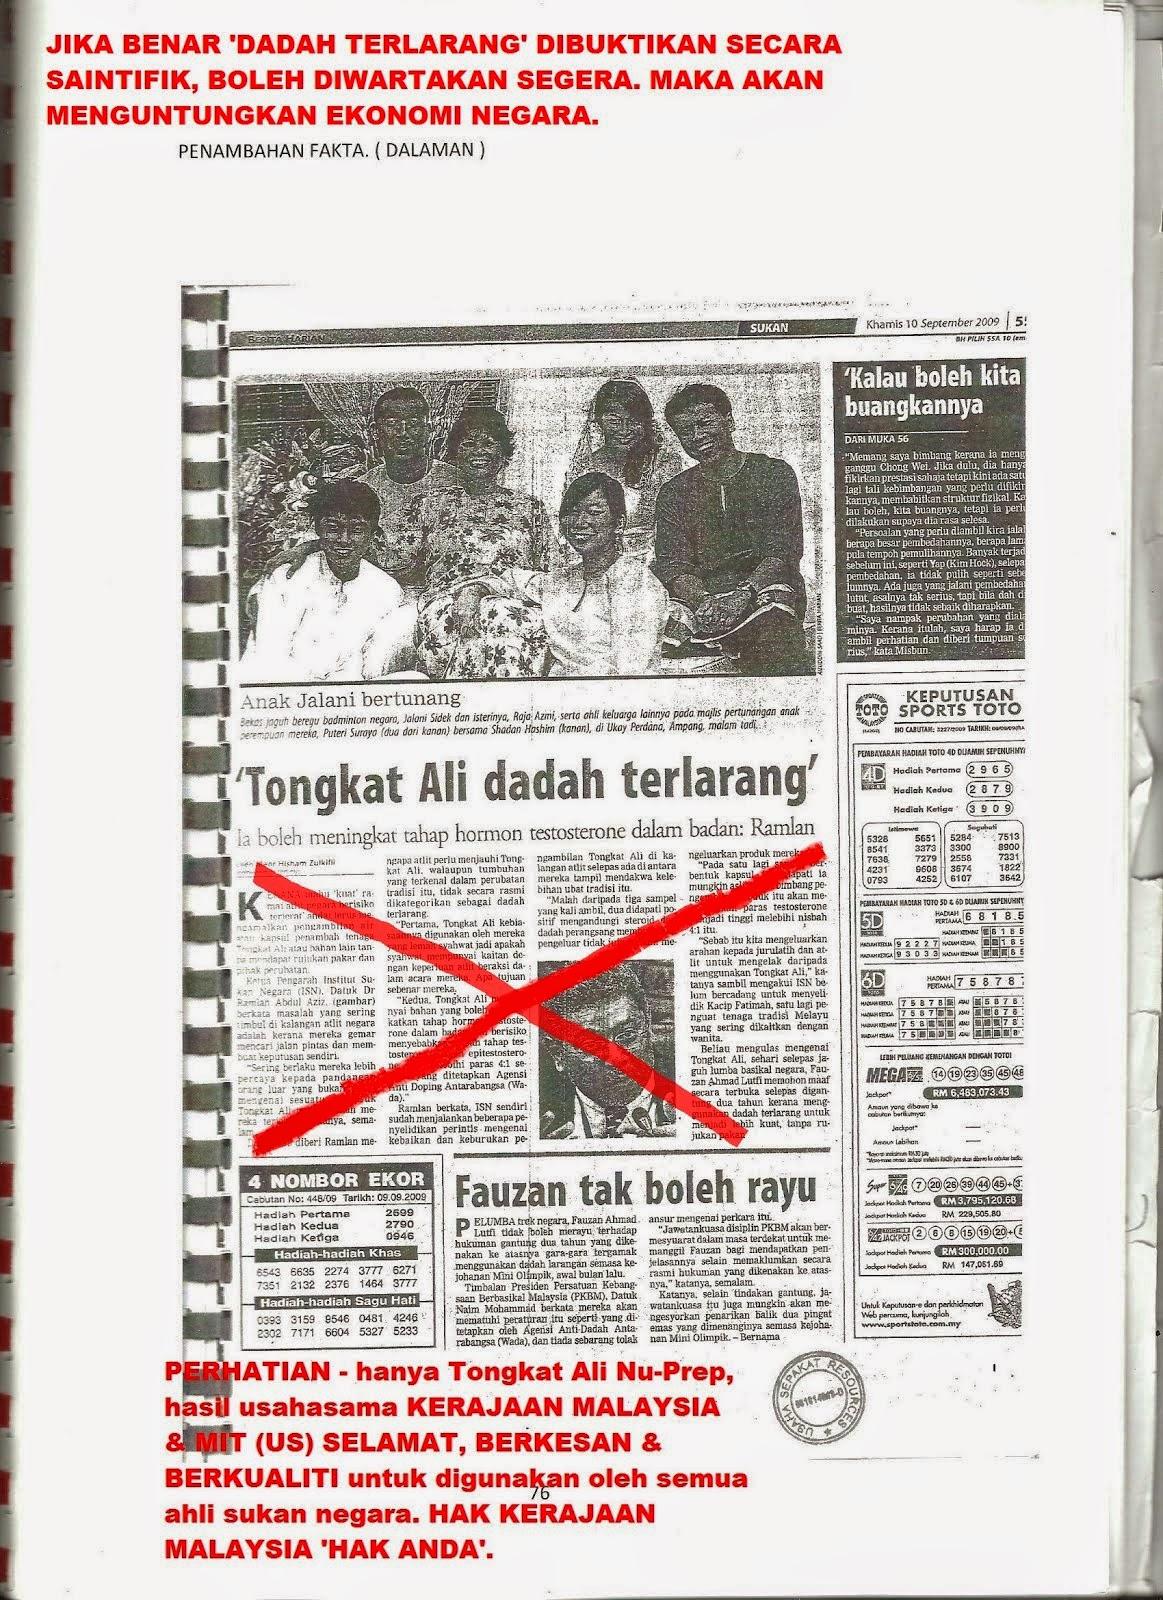 PENERAJU HERBA NEGARA TONGKAT ALI NU-PREP LELAKI TERHASIL DARI KERJASAMA KERAJAAN MALAYSIA-MIT (US)